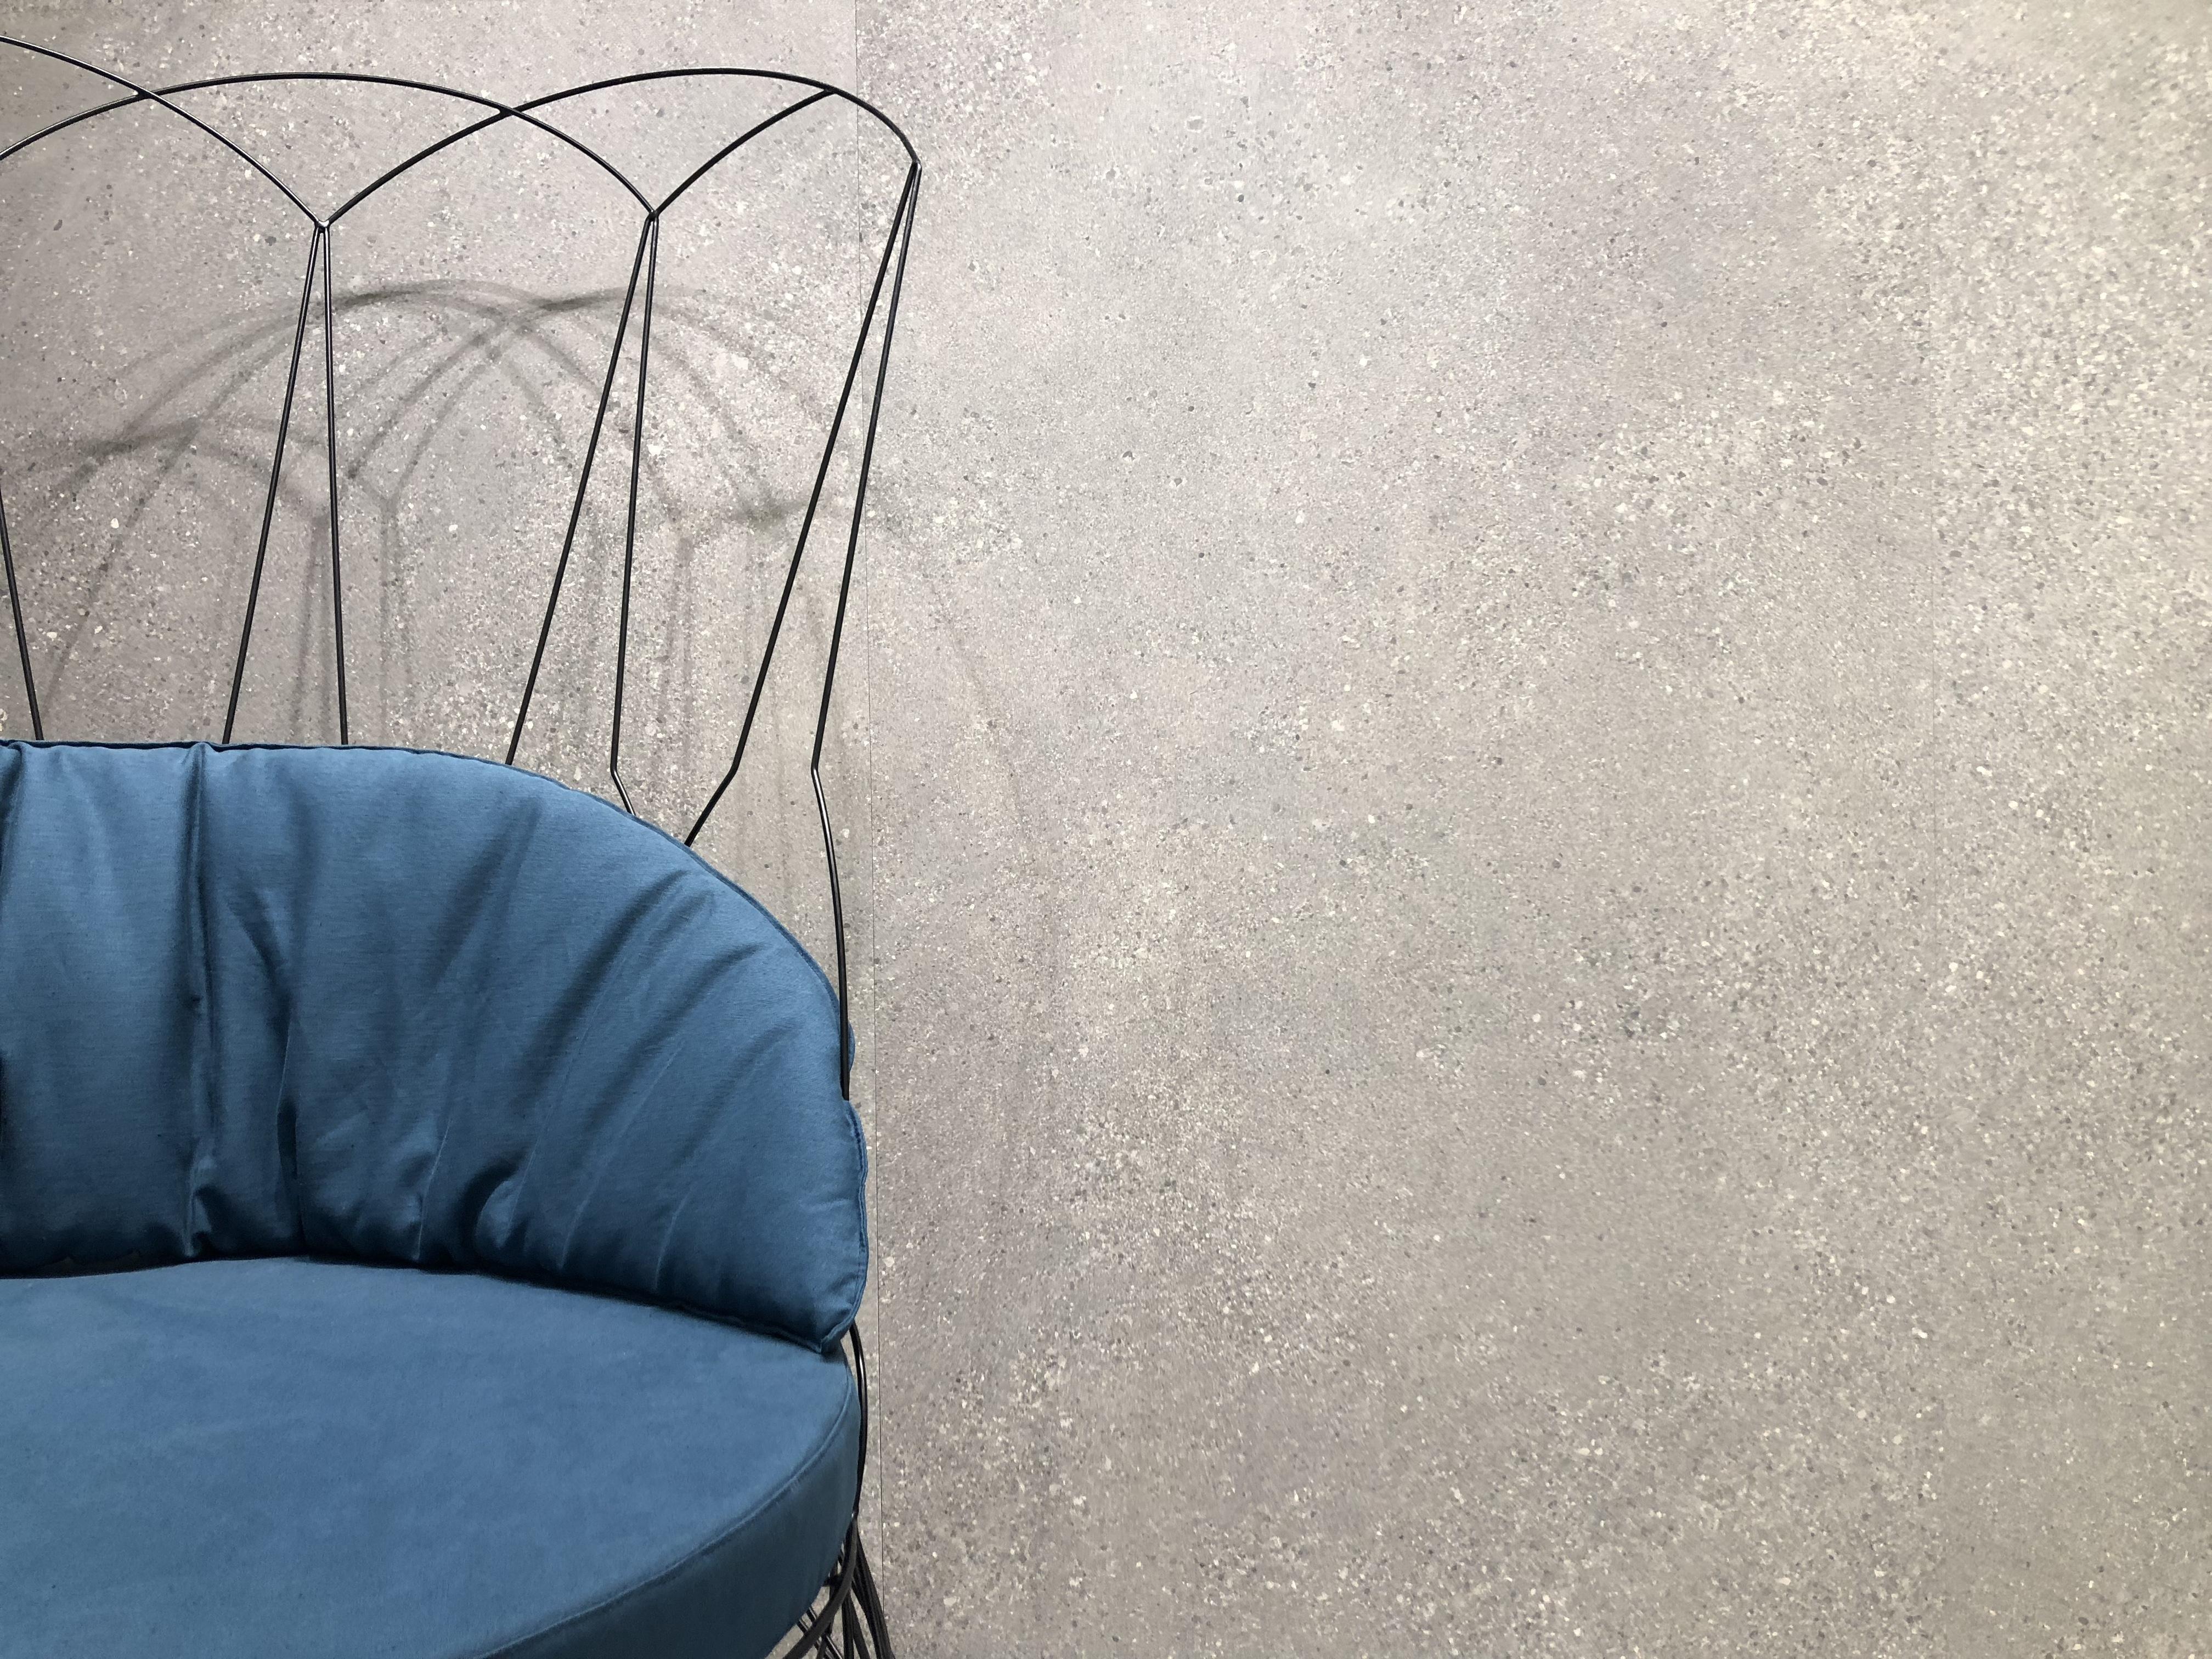 Grainstone Grey Fine - Cersaie 2018